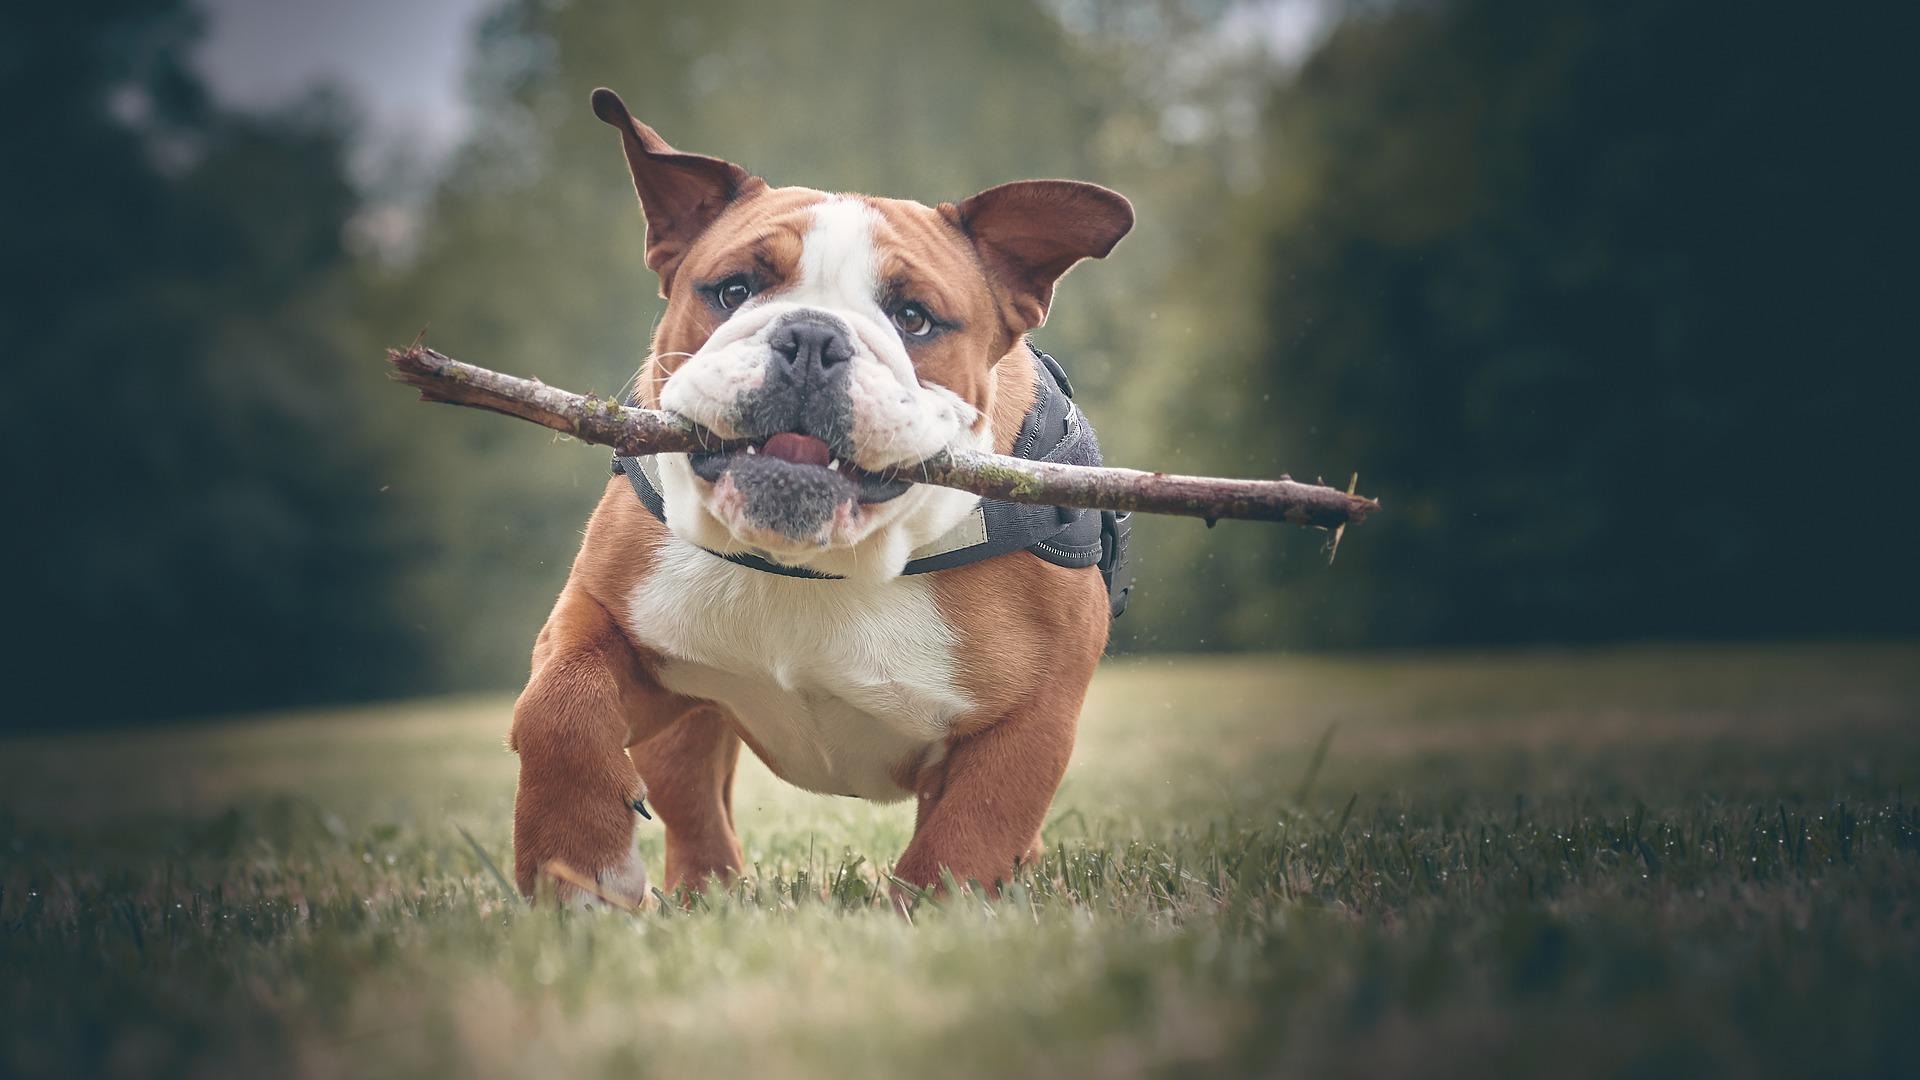 Engelse Buldog - Engelse hondenrassen